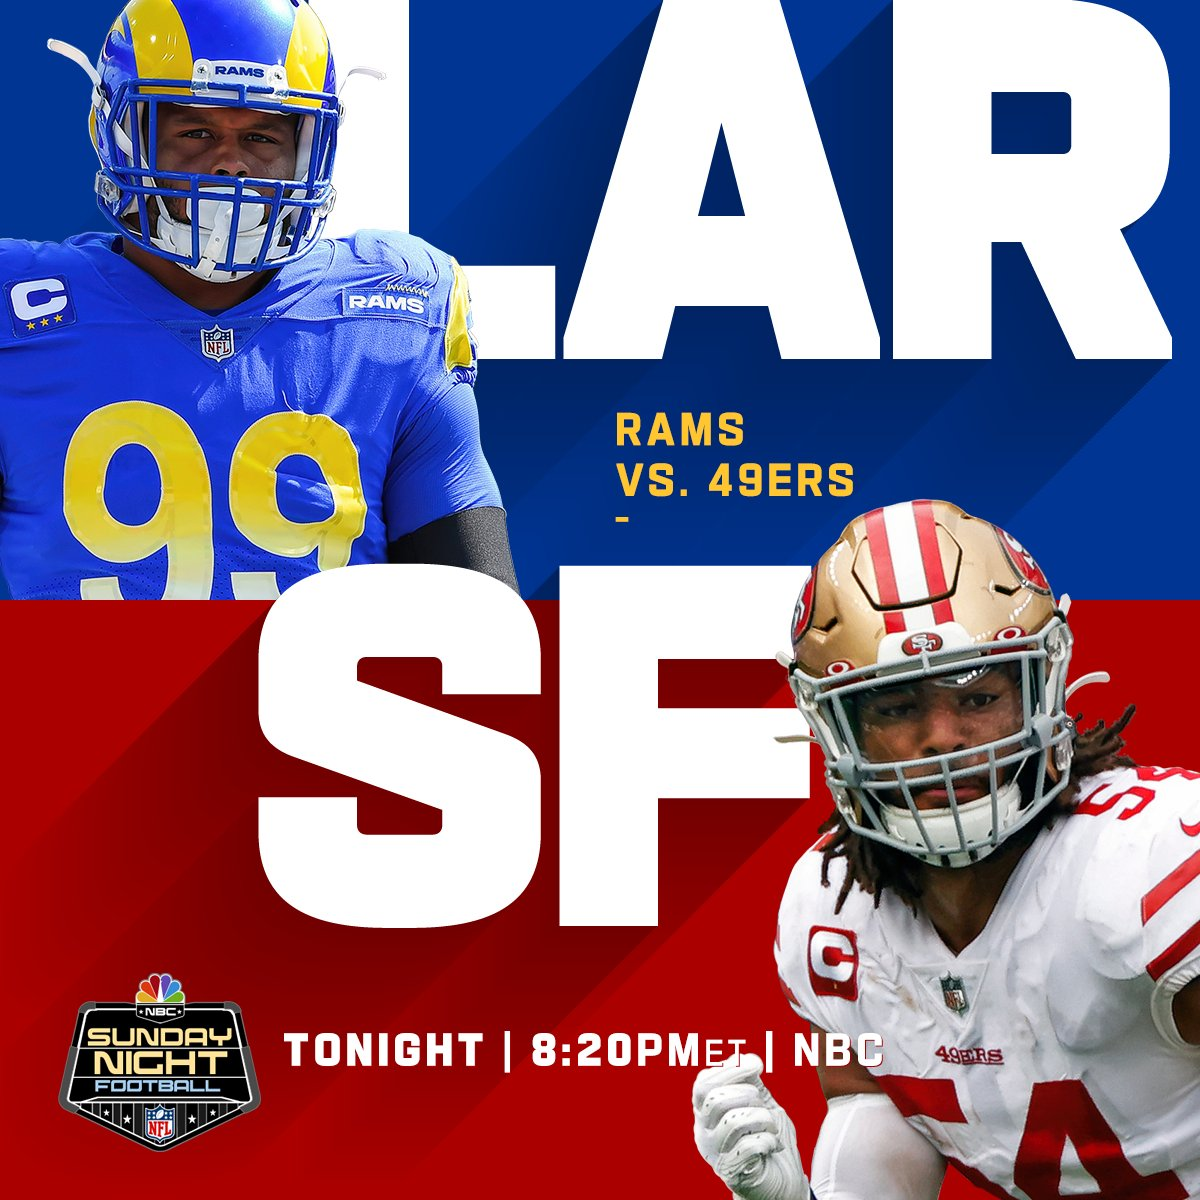 Big game in the NFC West. @RamsNFL vs @49ers on Sunday Night Football. 📺: #LARvsSF -- TONIGHT 8:20pm ET on NBC 📱: NFL app // Yahoo Sports app